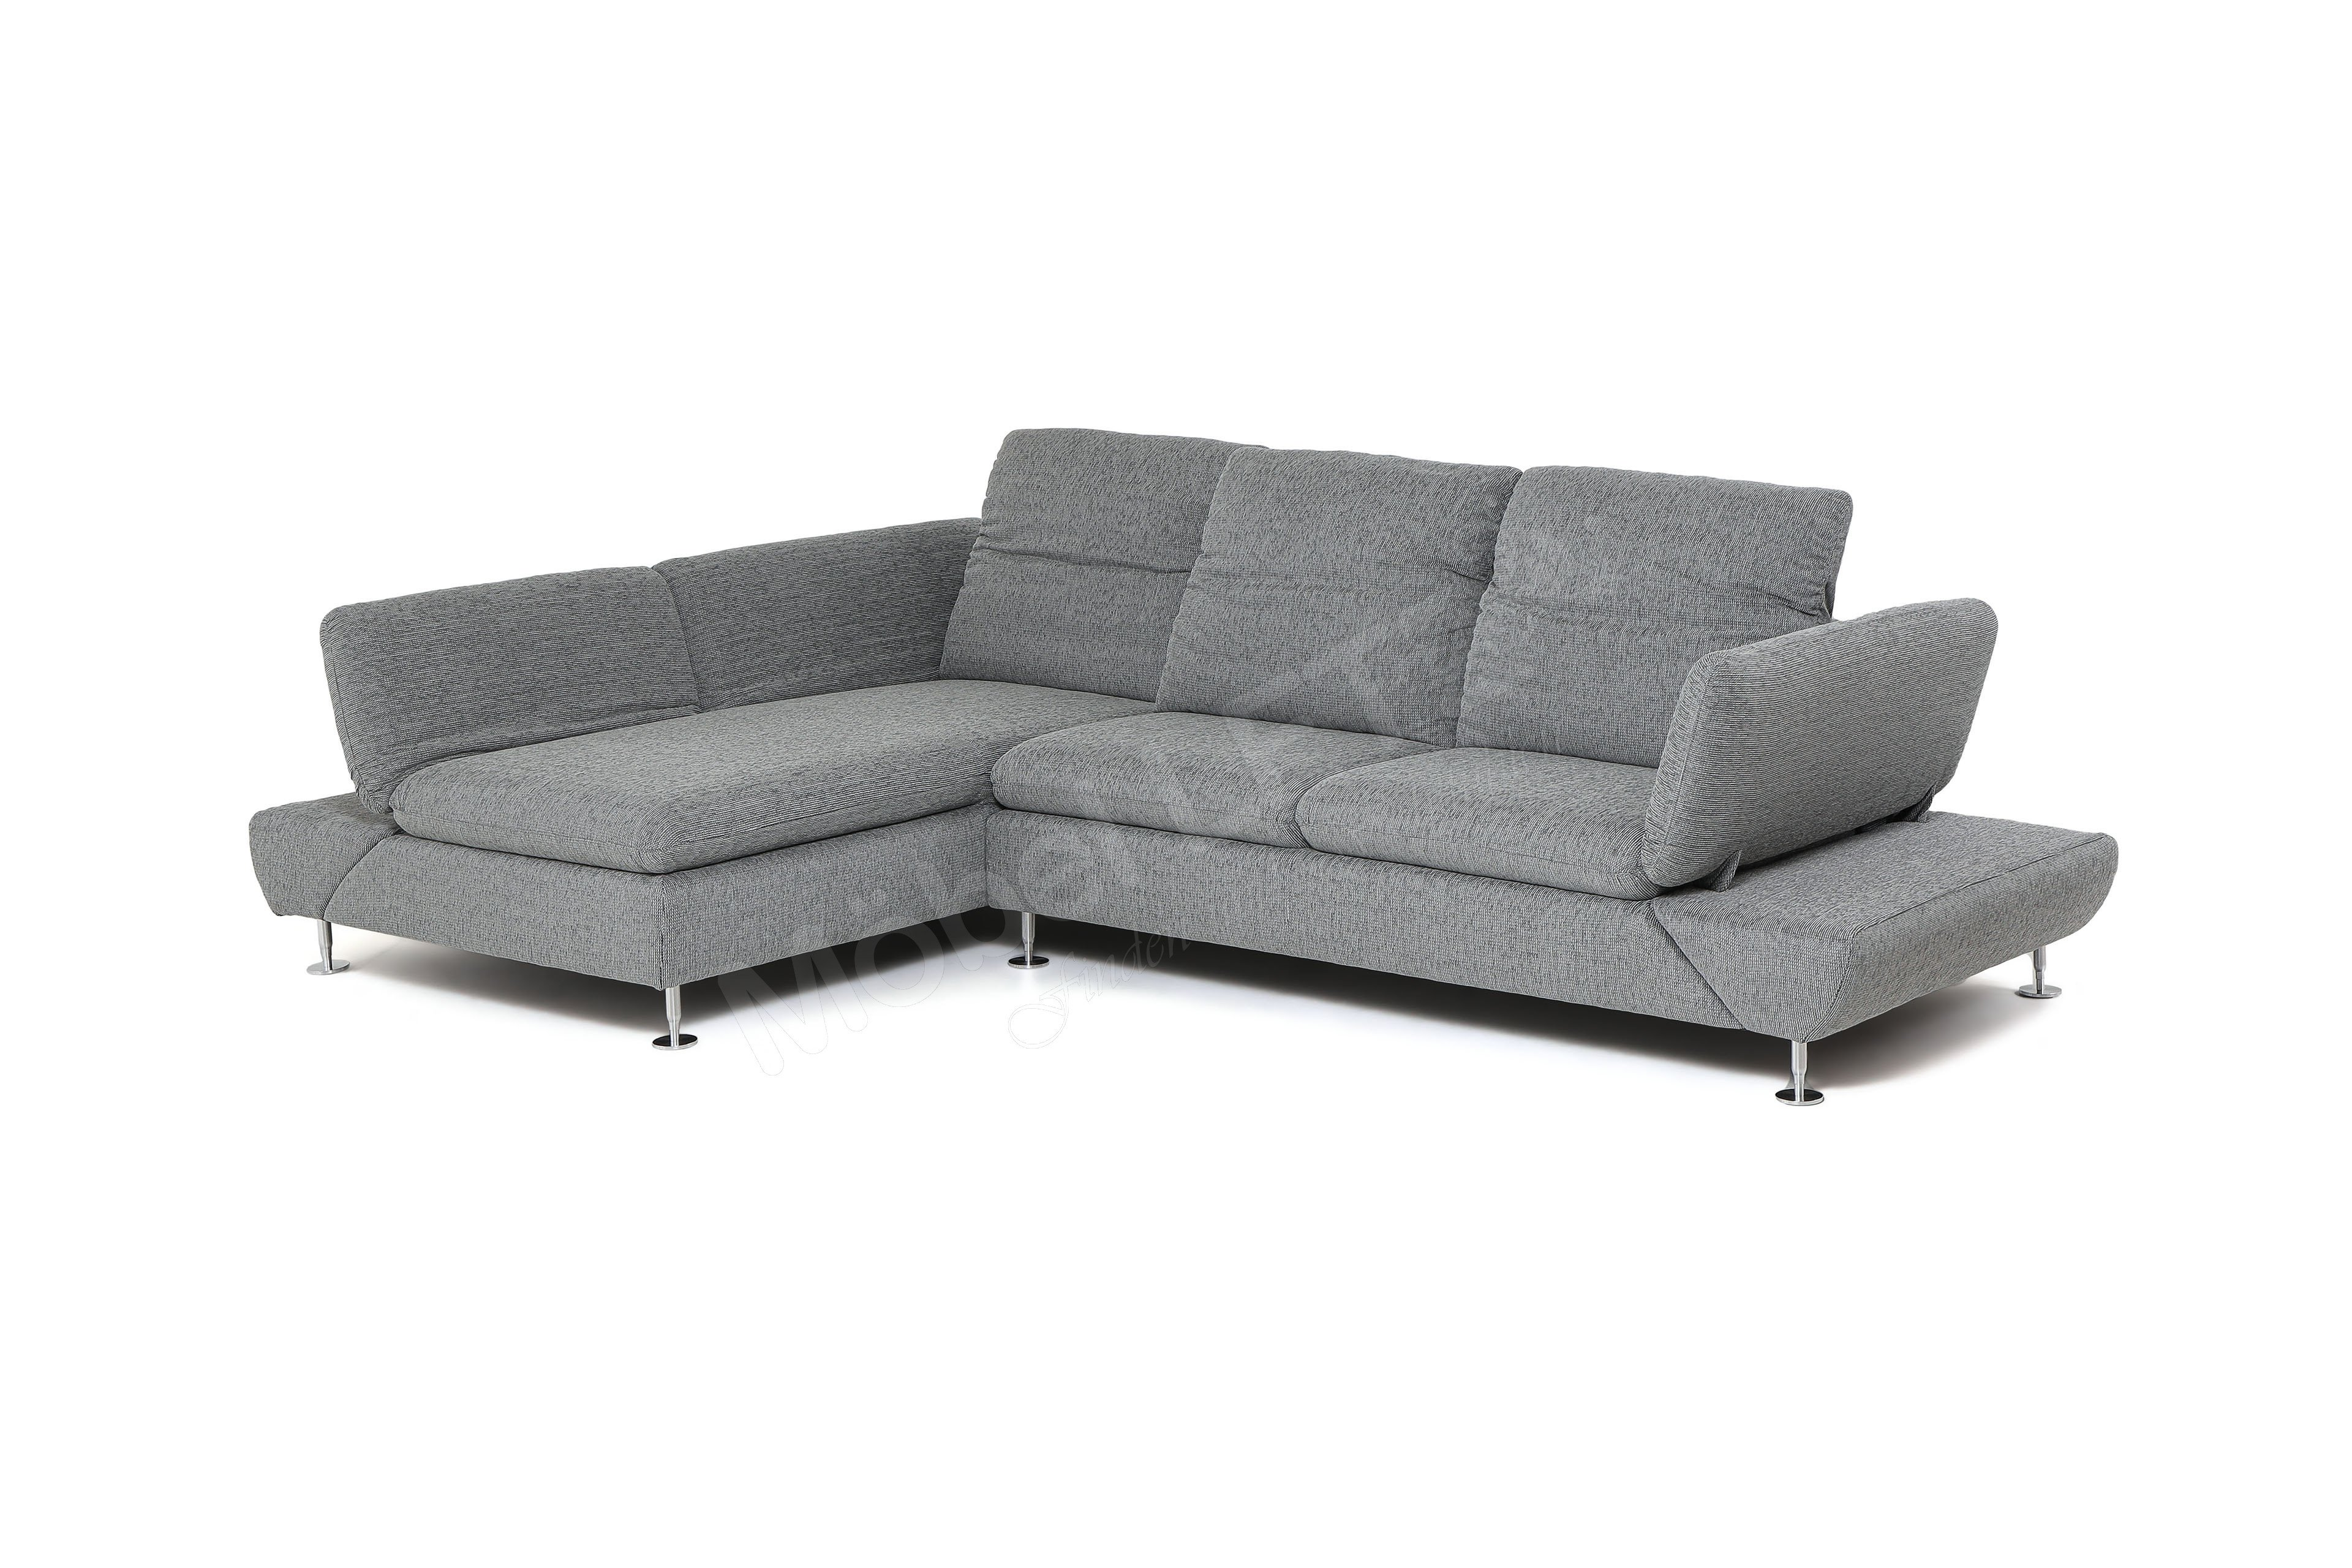 willi schillig 15278 taoo ecksofa in silbergrau m bel. Black Bedroom Furniture Sets. Home Design Ideas